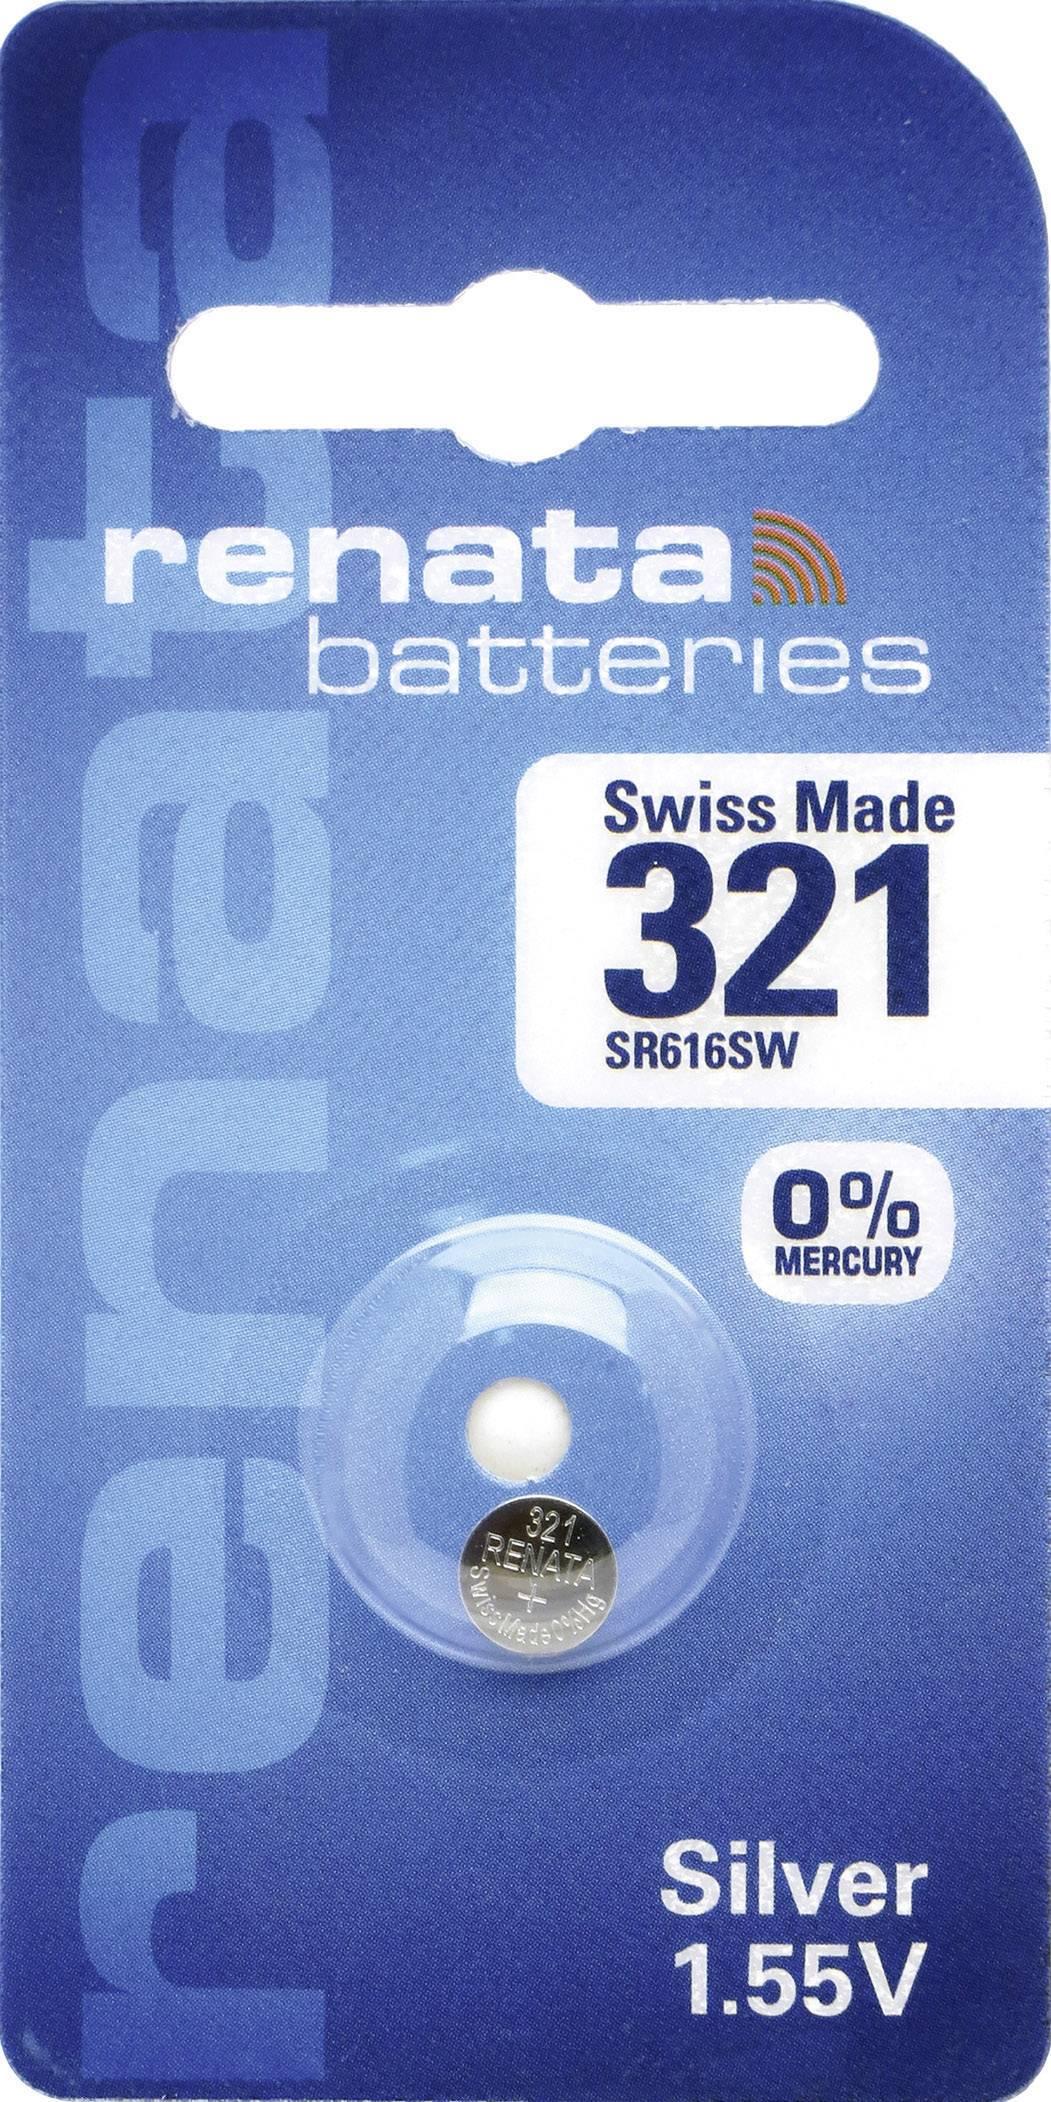 Knoflíková baterie 319, Renata SR64, na bázi oxidu stříbra, 319.CU MF